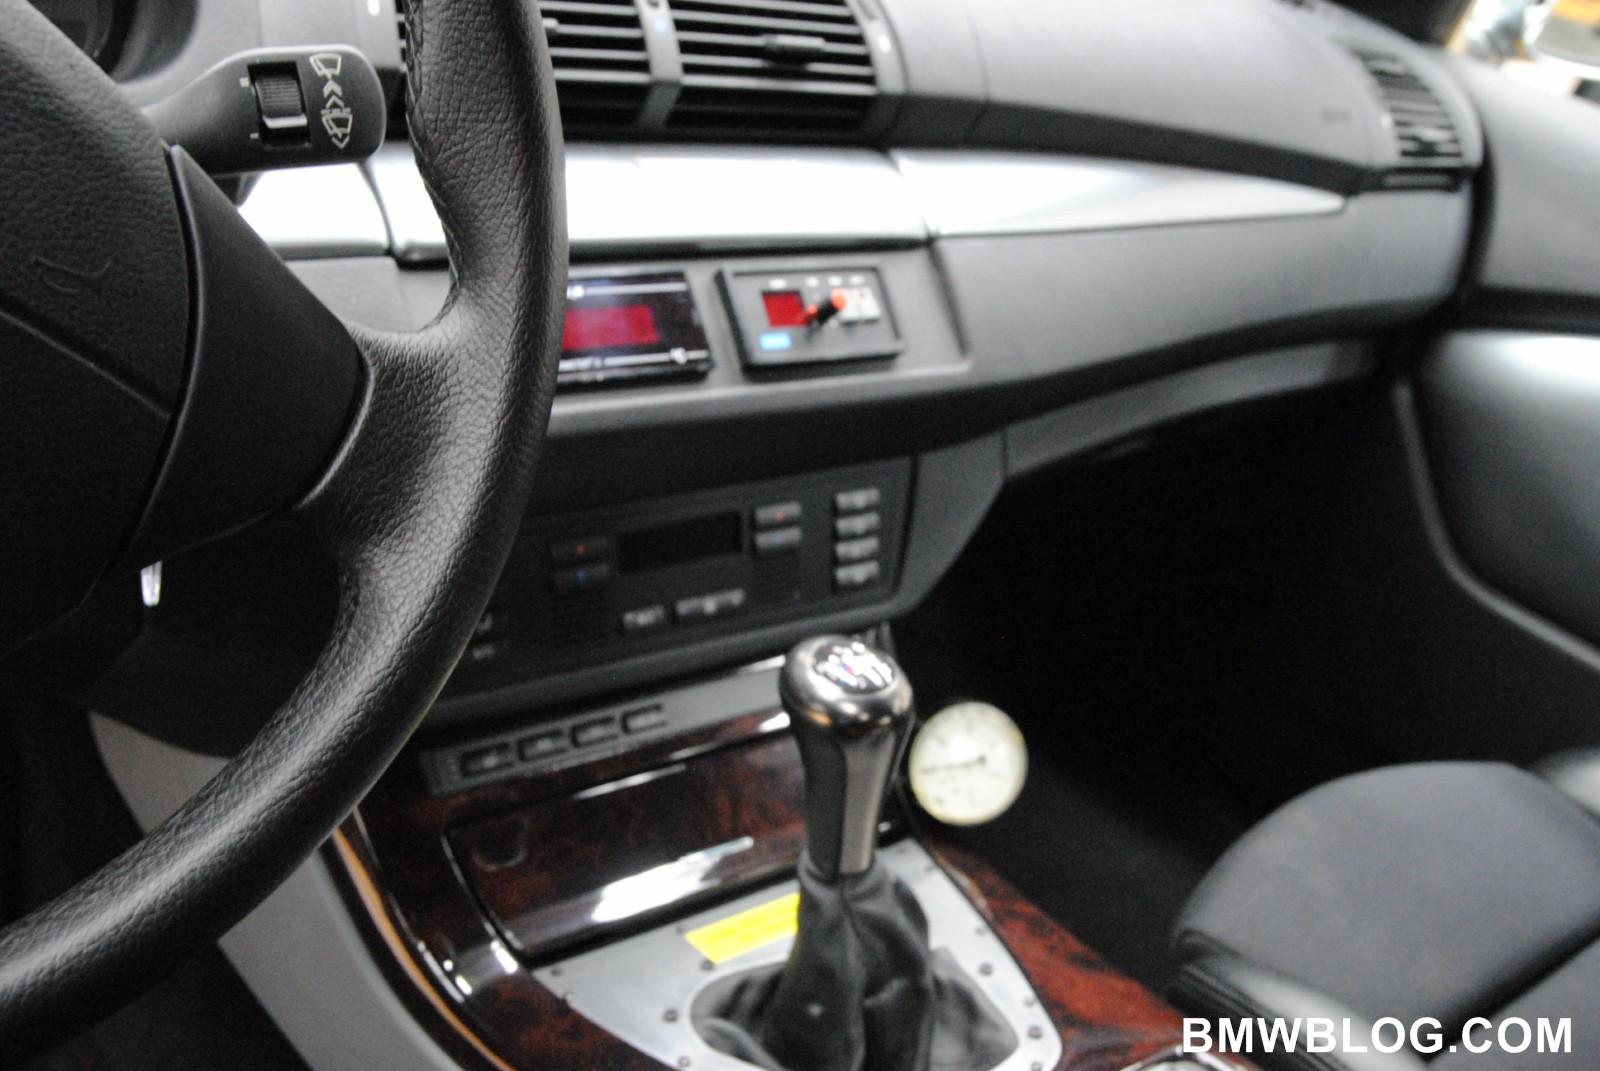 BMW X5 LeMans 59